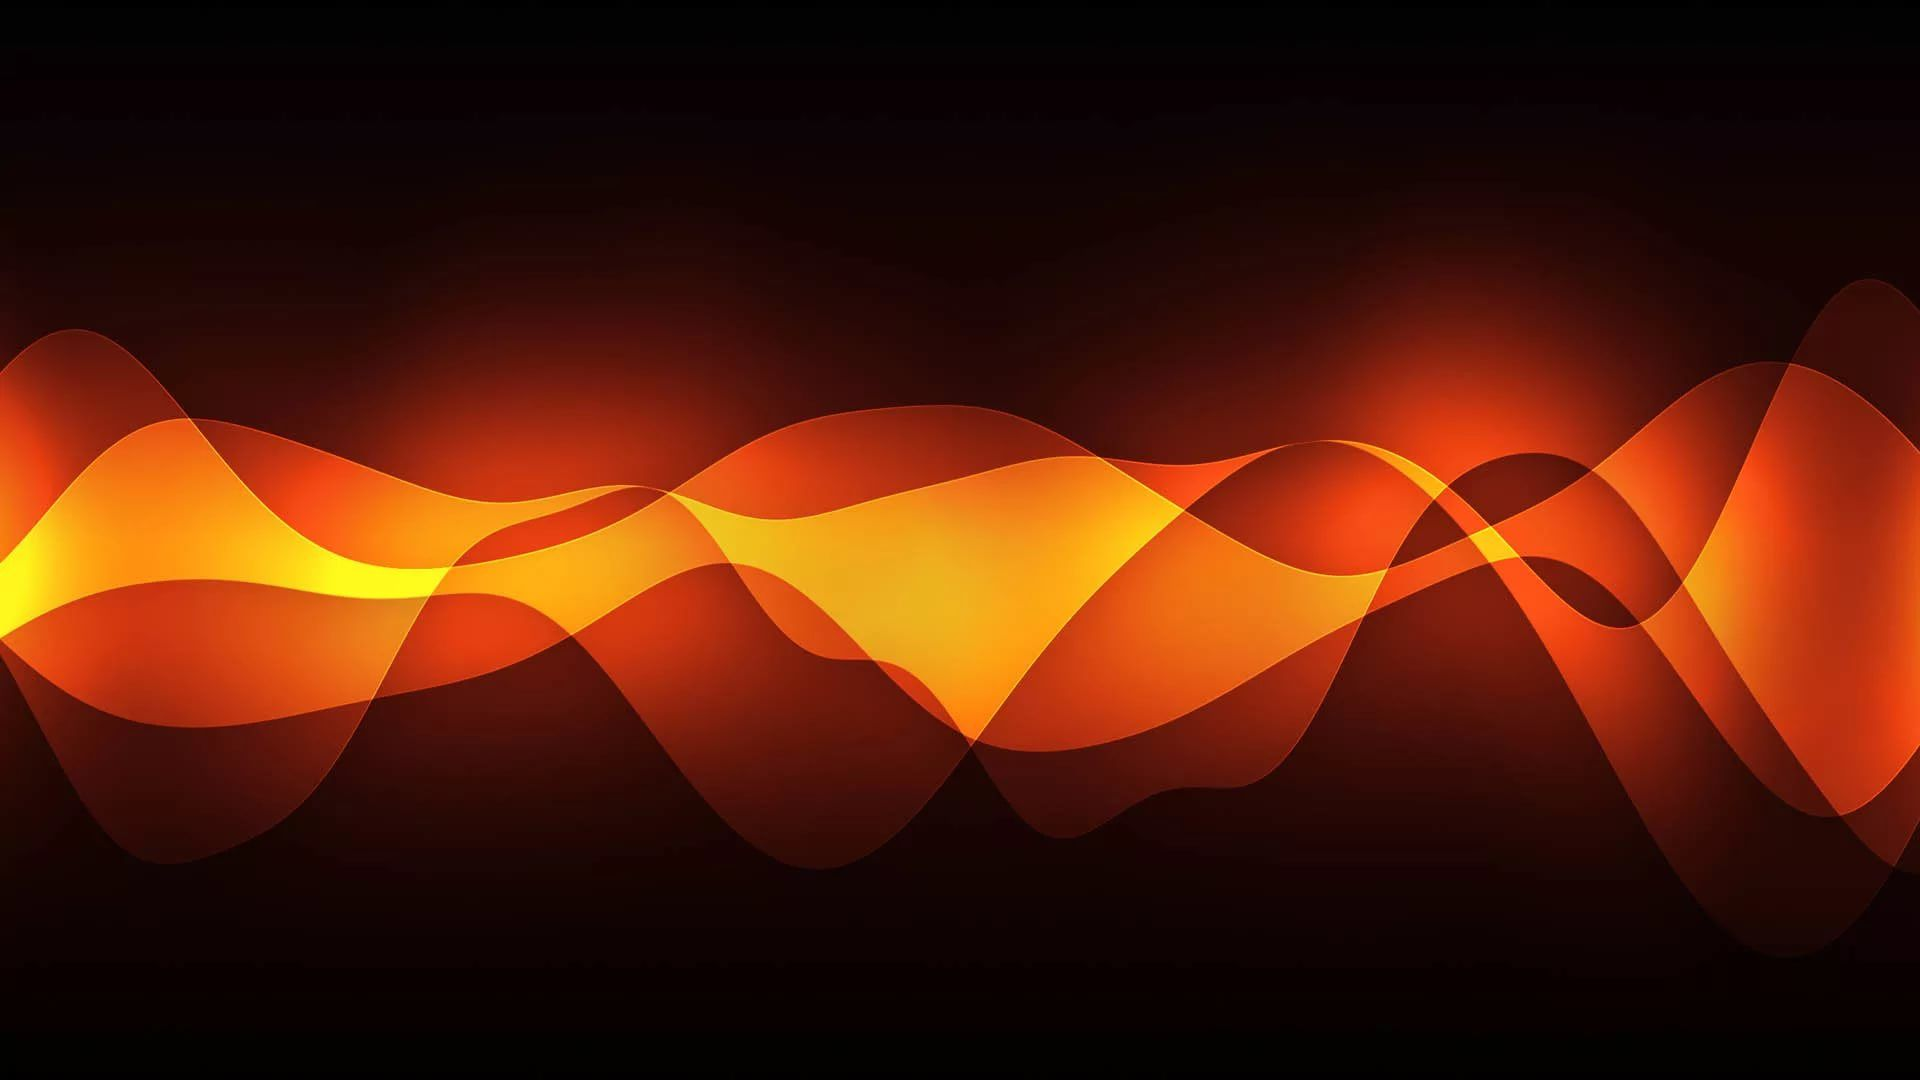 Black And Orange Desktop Wallpaper